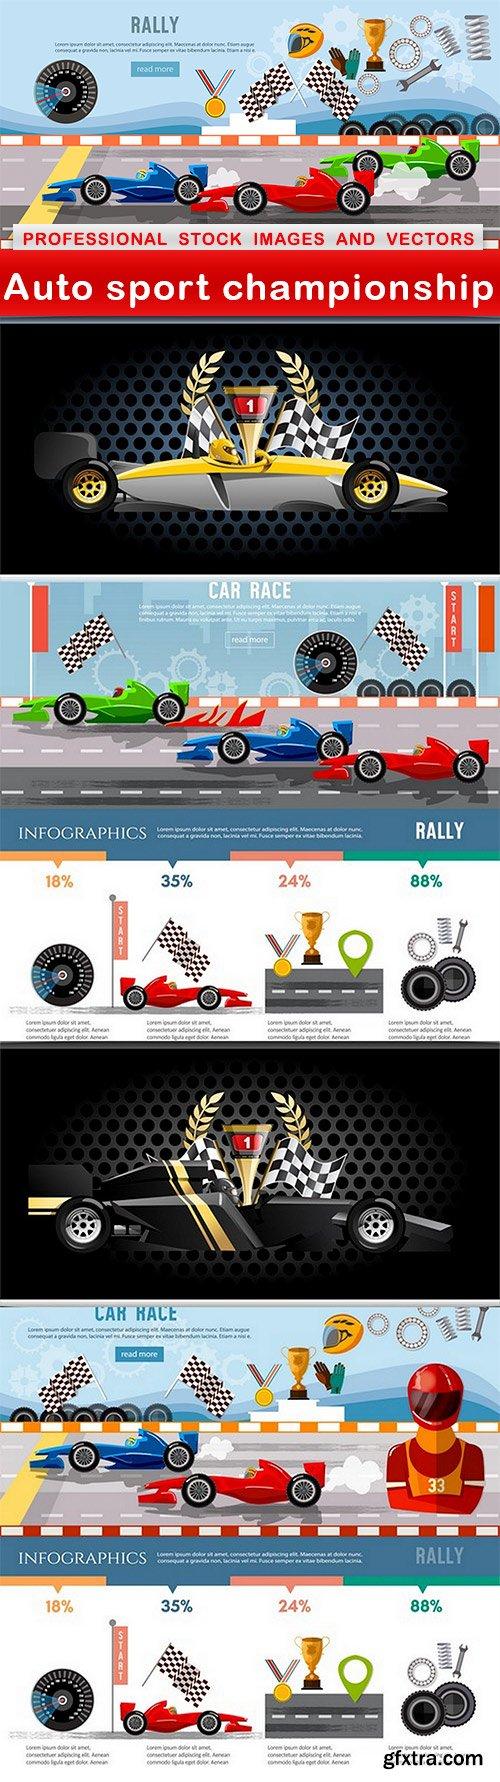 Auto sport championship - 5 EPS